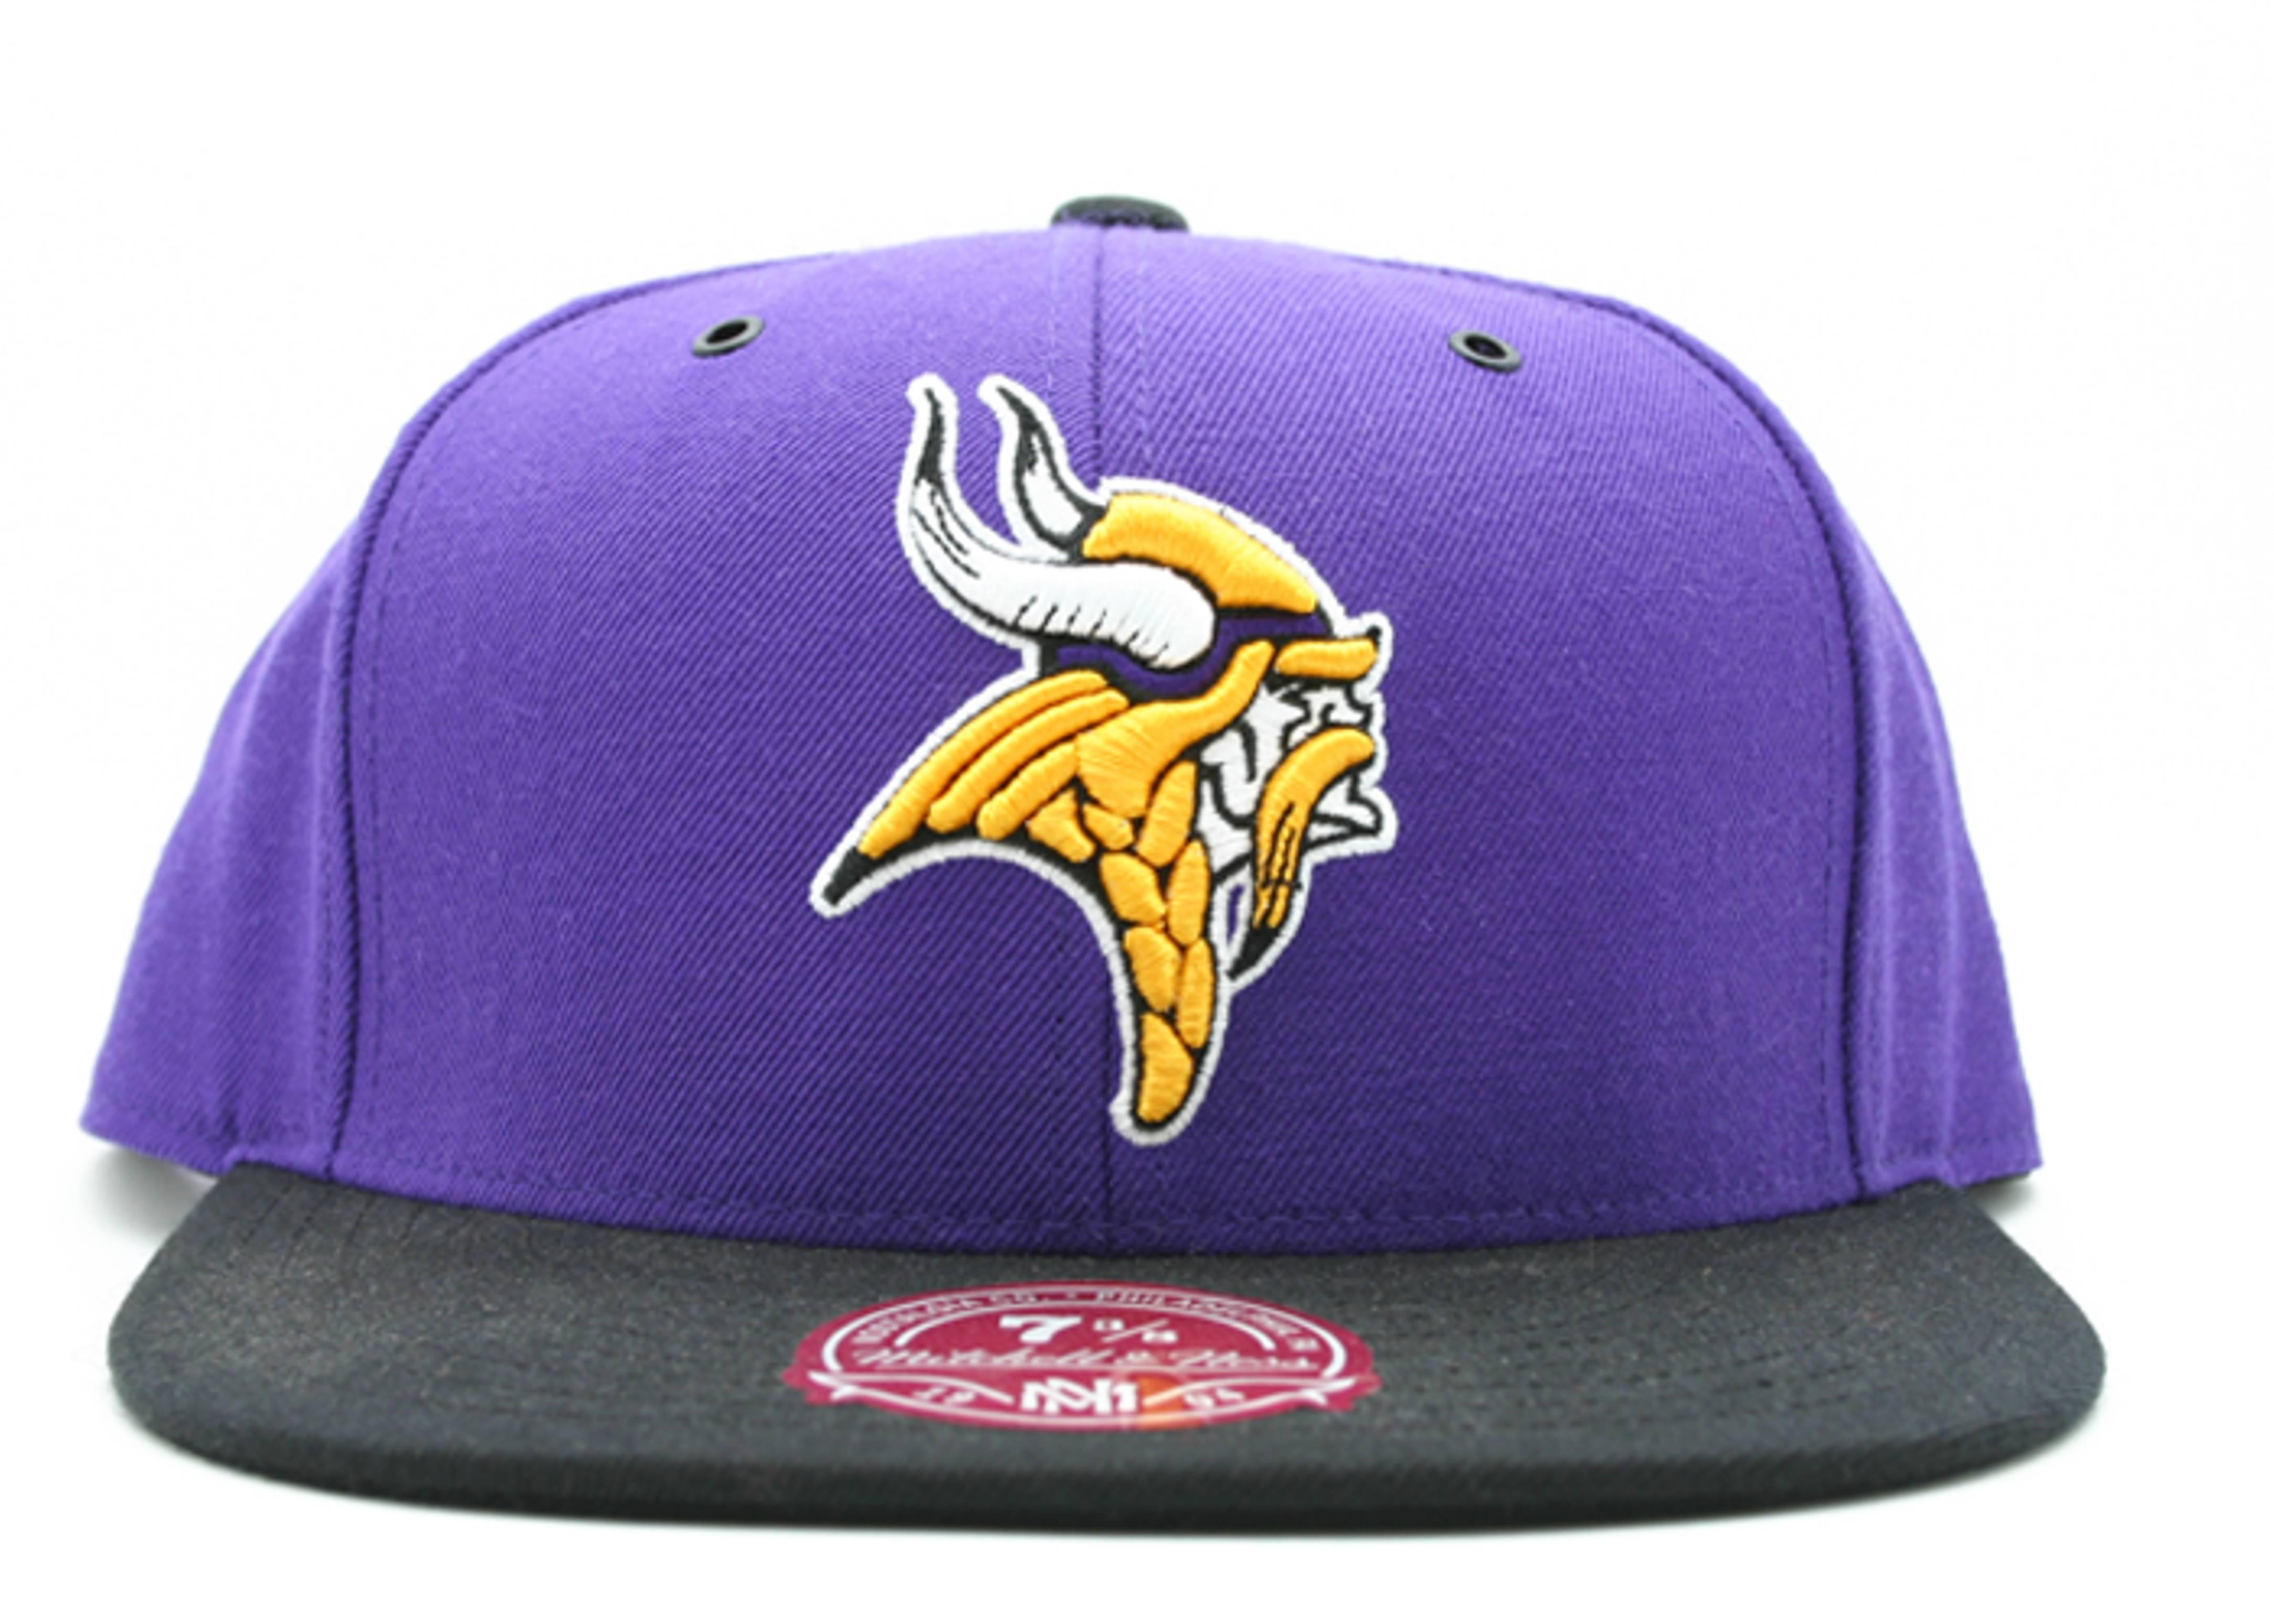 sale retailer 6f765 4c8ff Minnesota Vikings Fitted - Mitchell & Ness - tt26bte6vikin ...